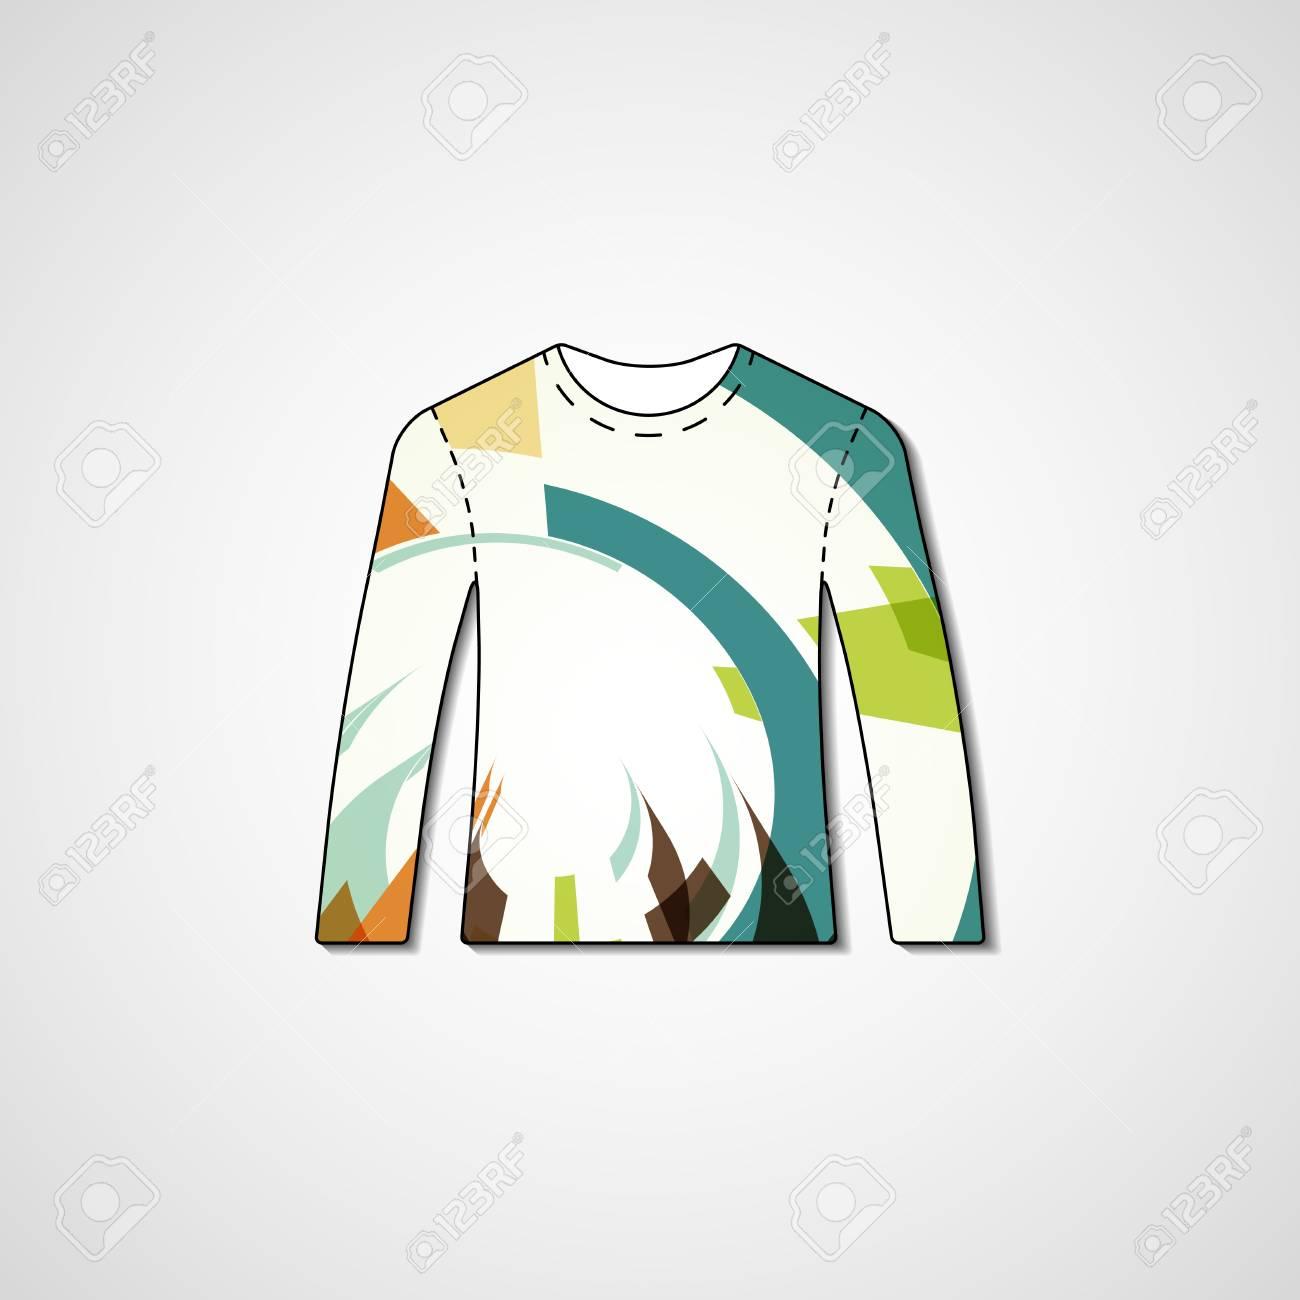 bbb3d80ef Abstract illustration on sweater Stock Illustration - 33806561